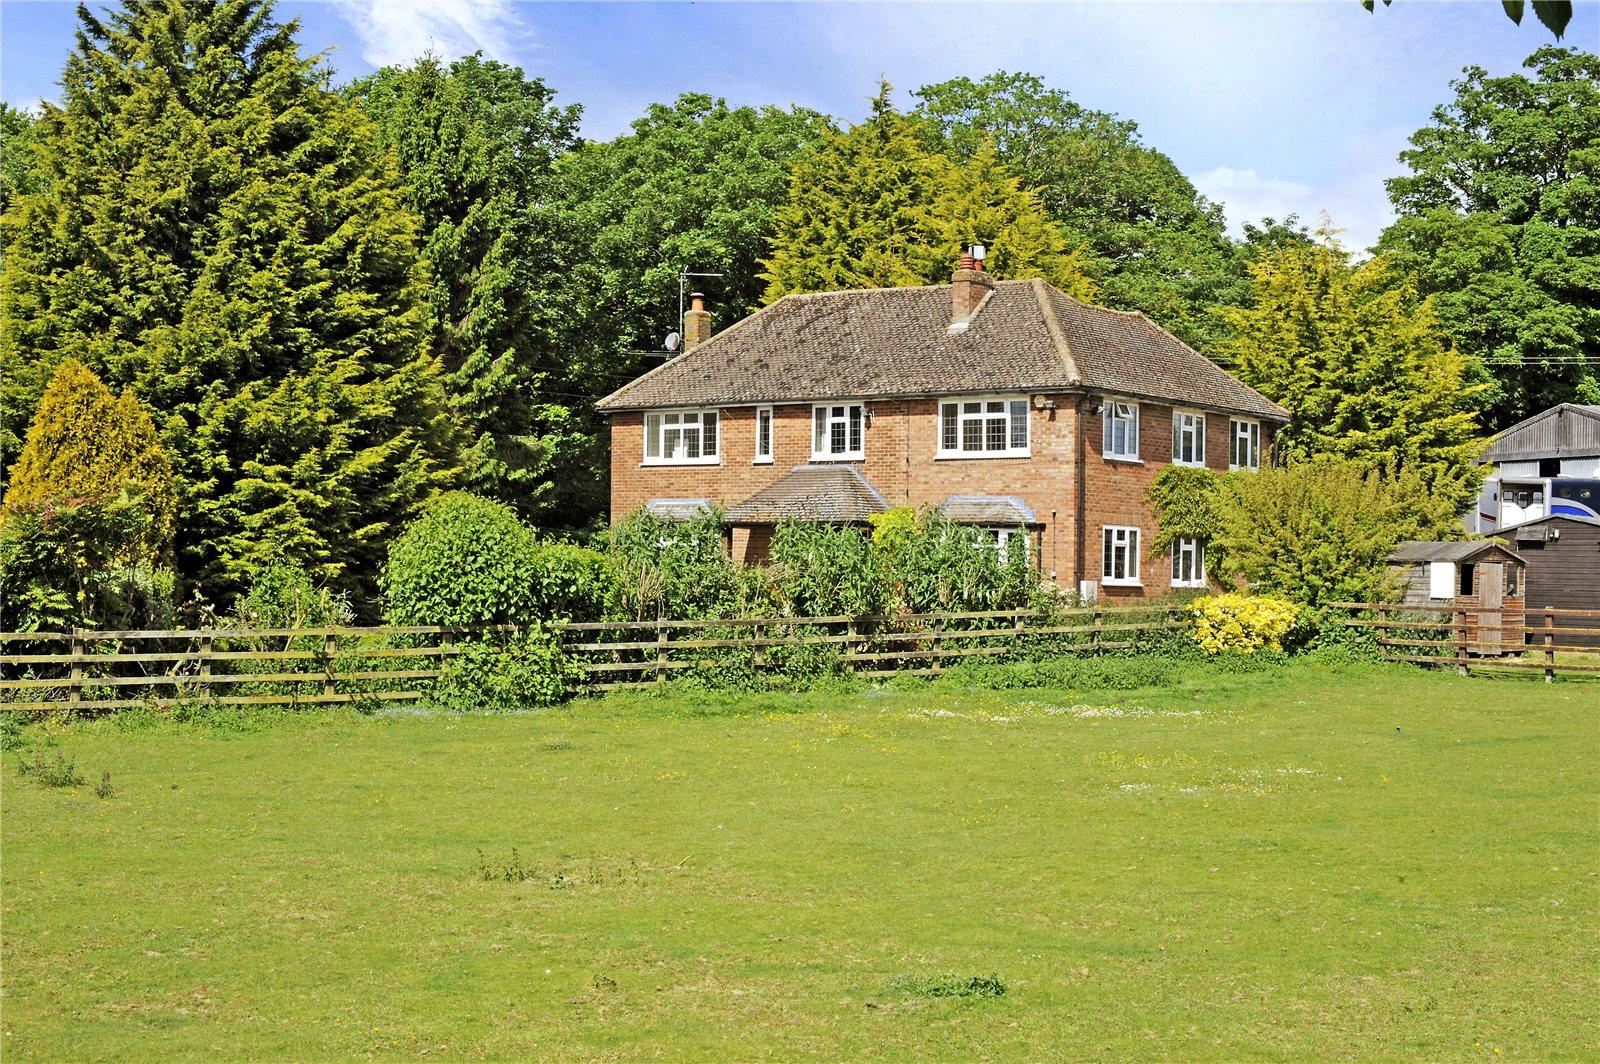 Casa para uma família para Venda às Wellbury Park, Hitchin, Hertfordshire, SG5 Hitchin, Inglaterra